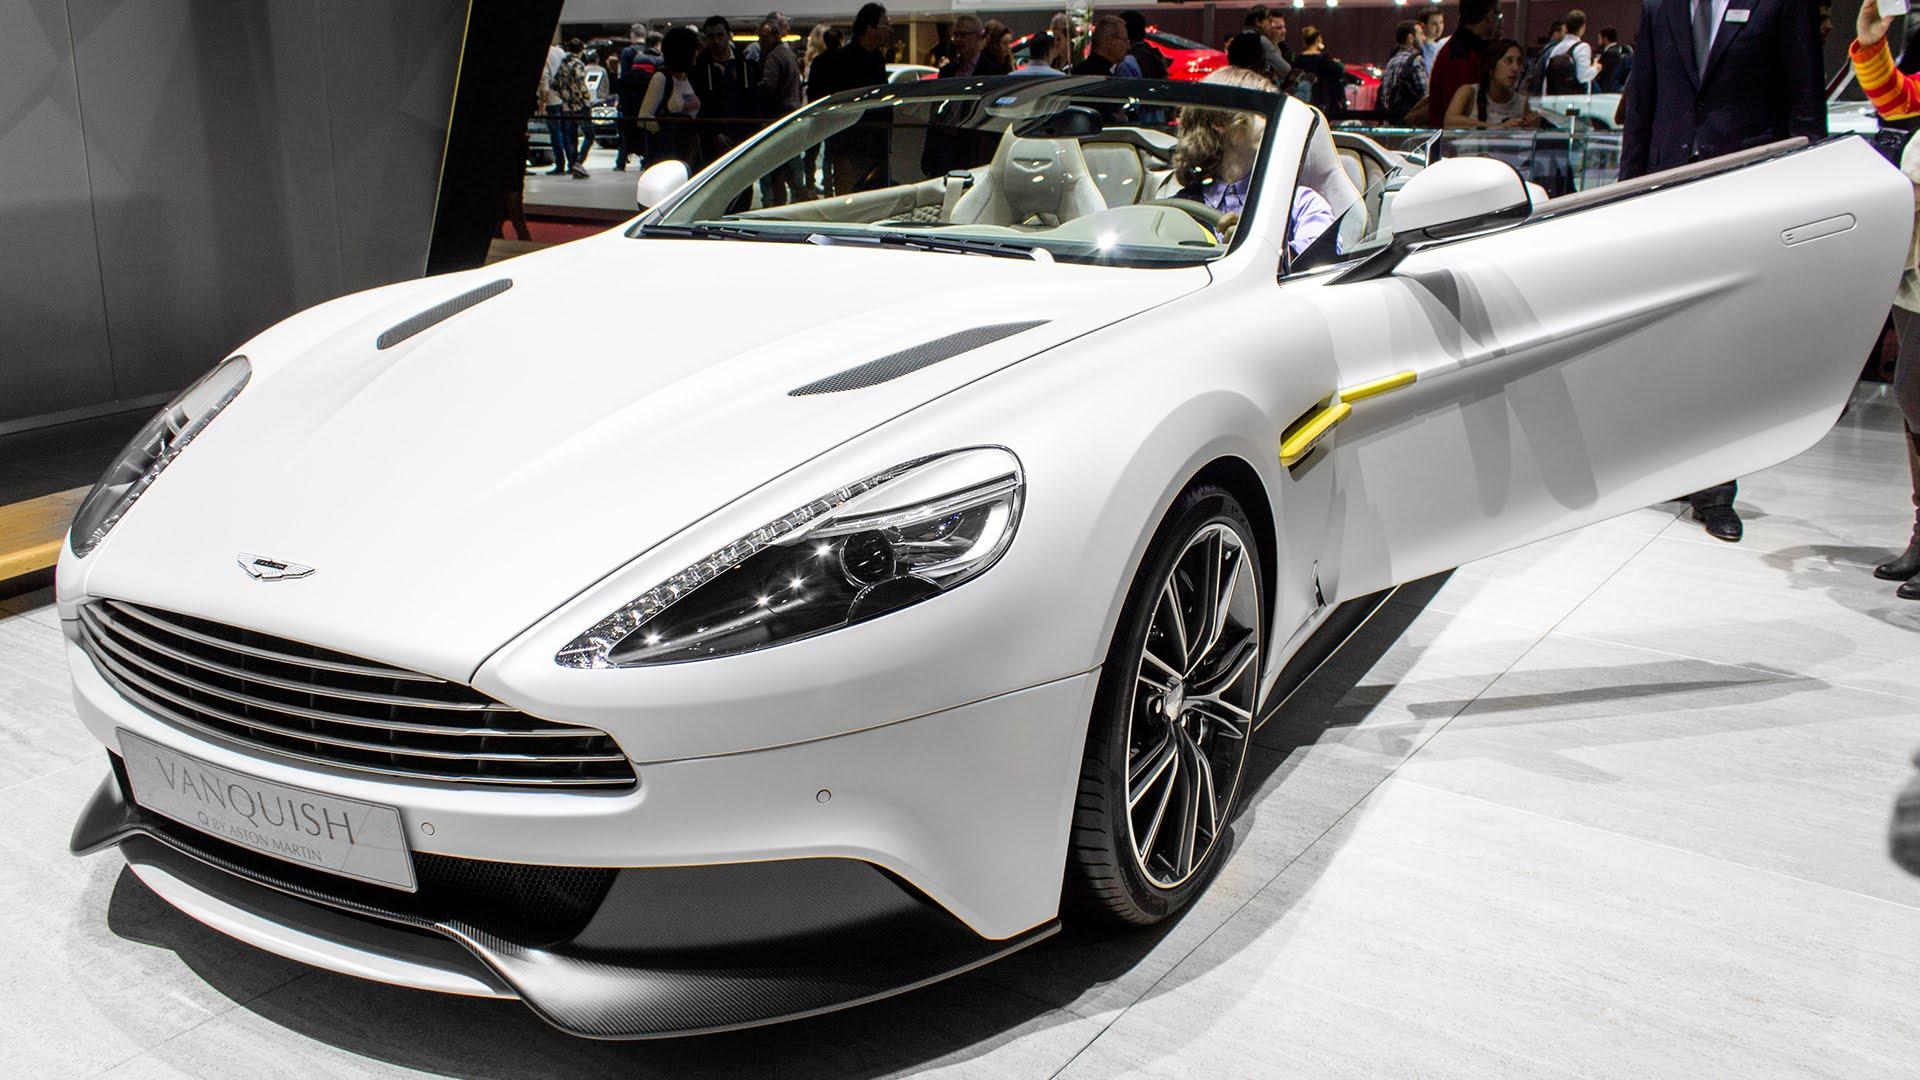 Aston Martin Vanquish Q Pics, Vehicles Collection